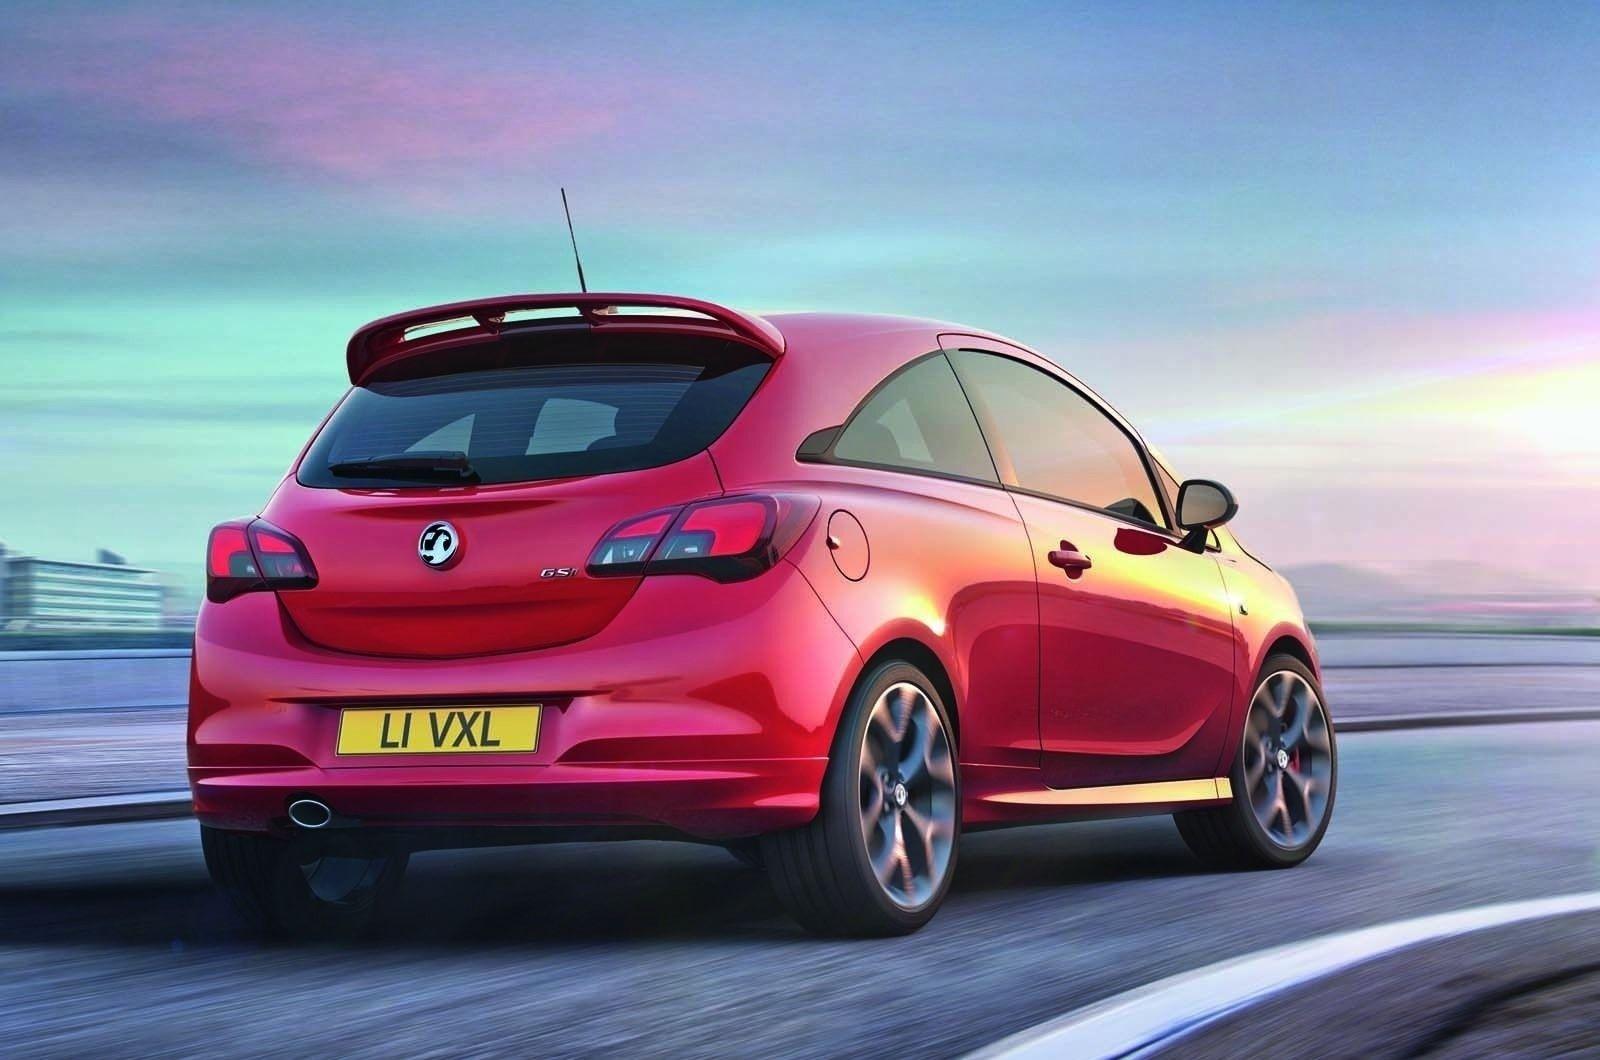 Latest News On 2020 Vauxhall Corsa Interior Vauxhall Corsa Vauxhall Reveal Pictures